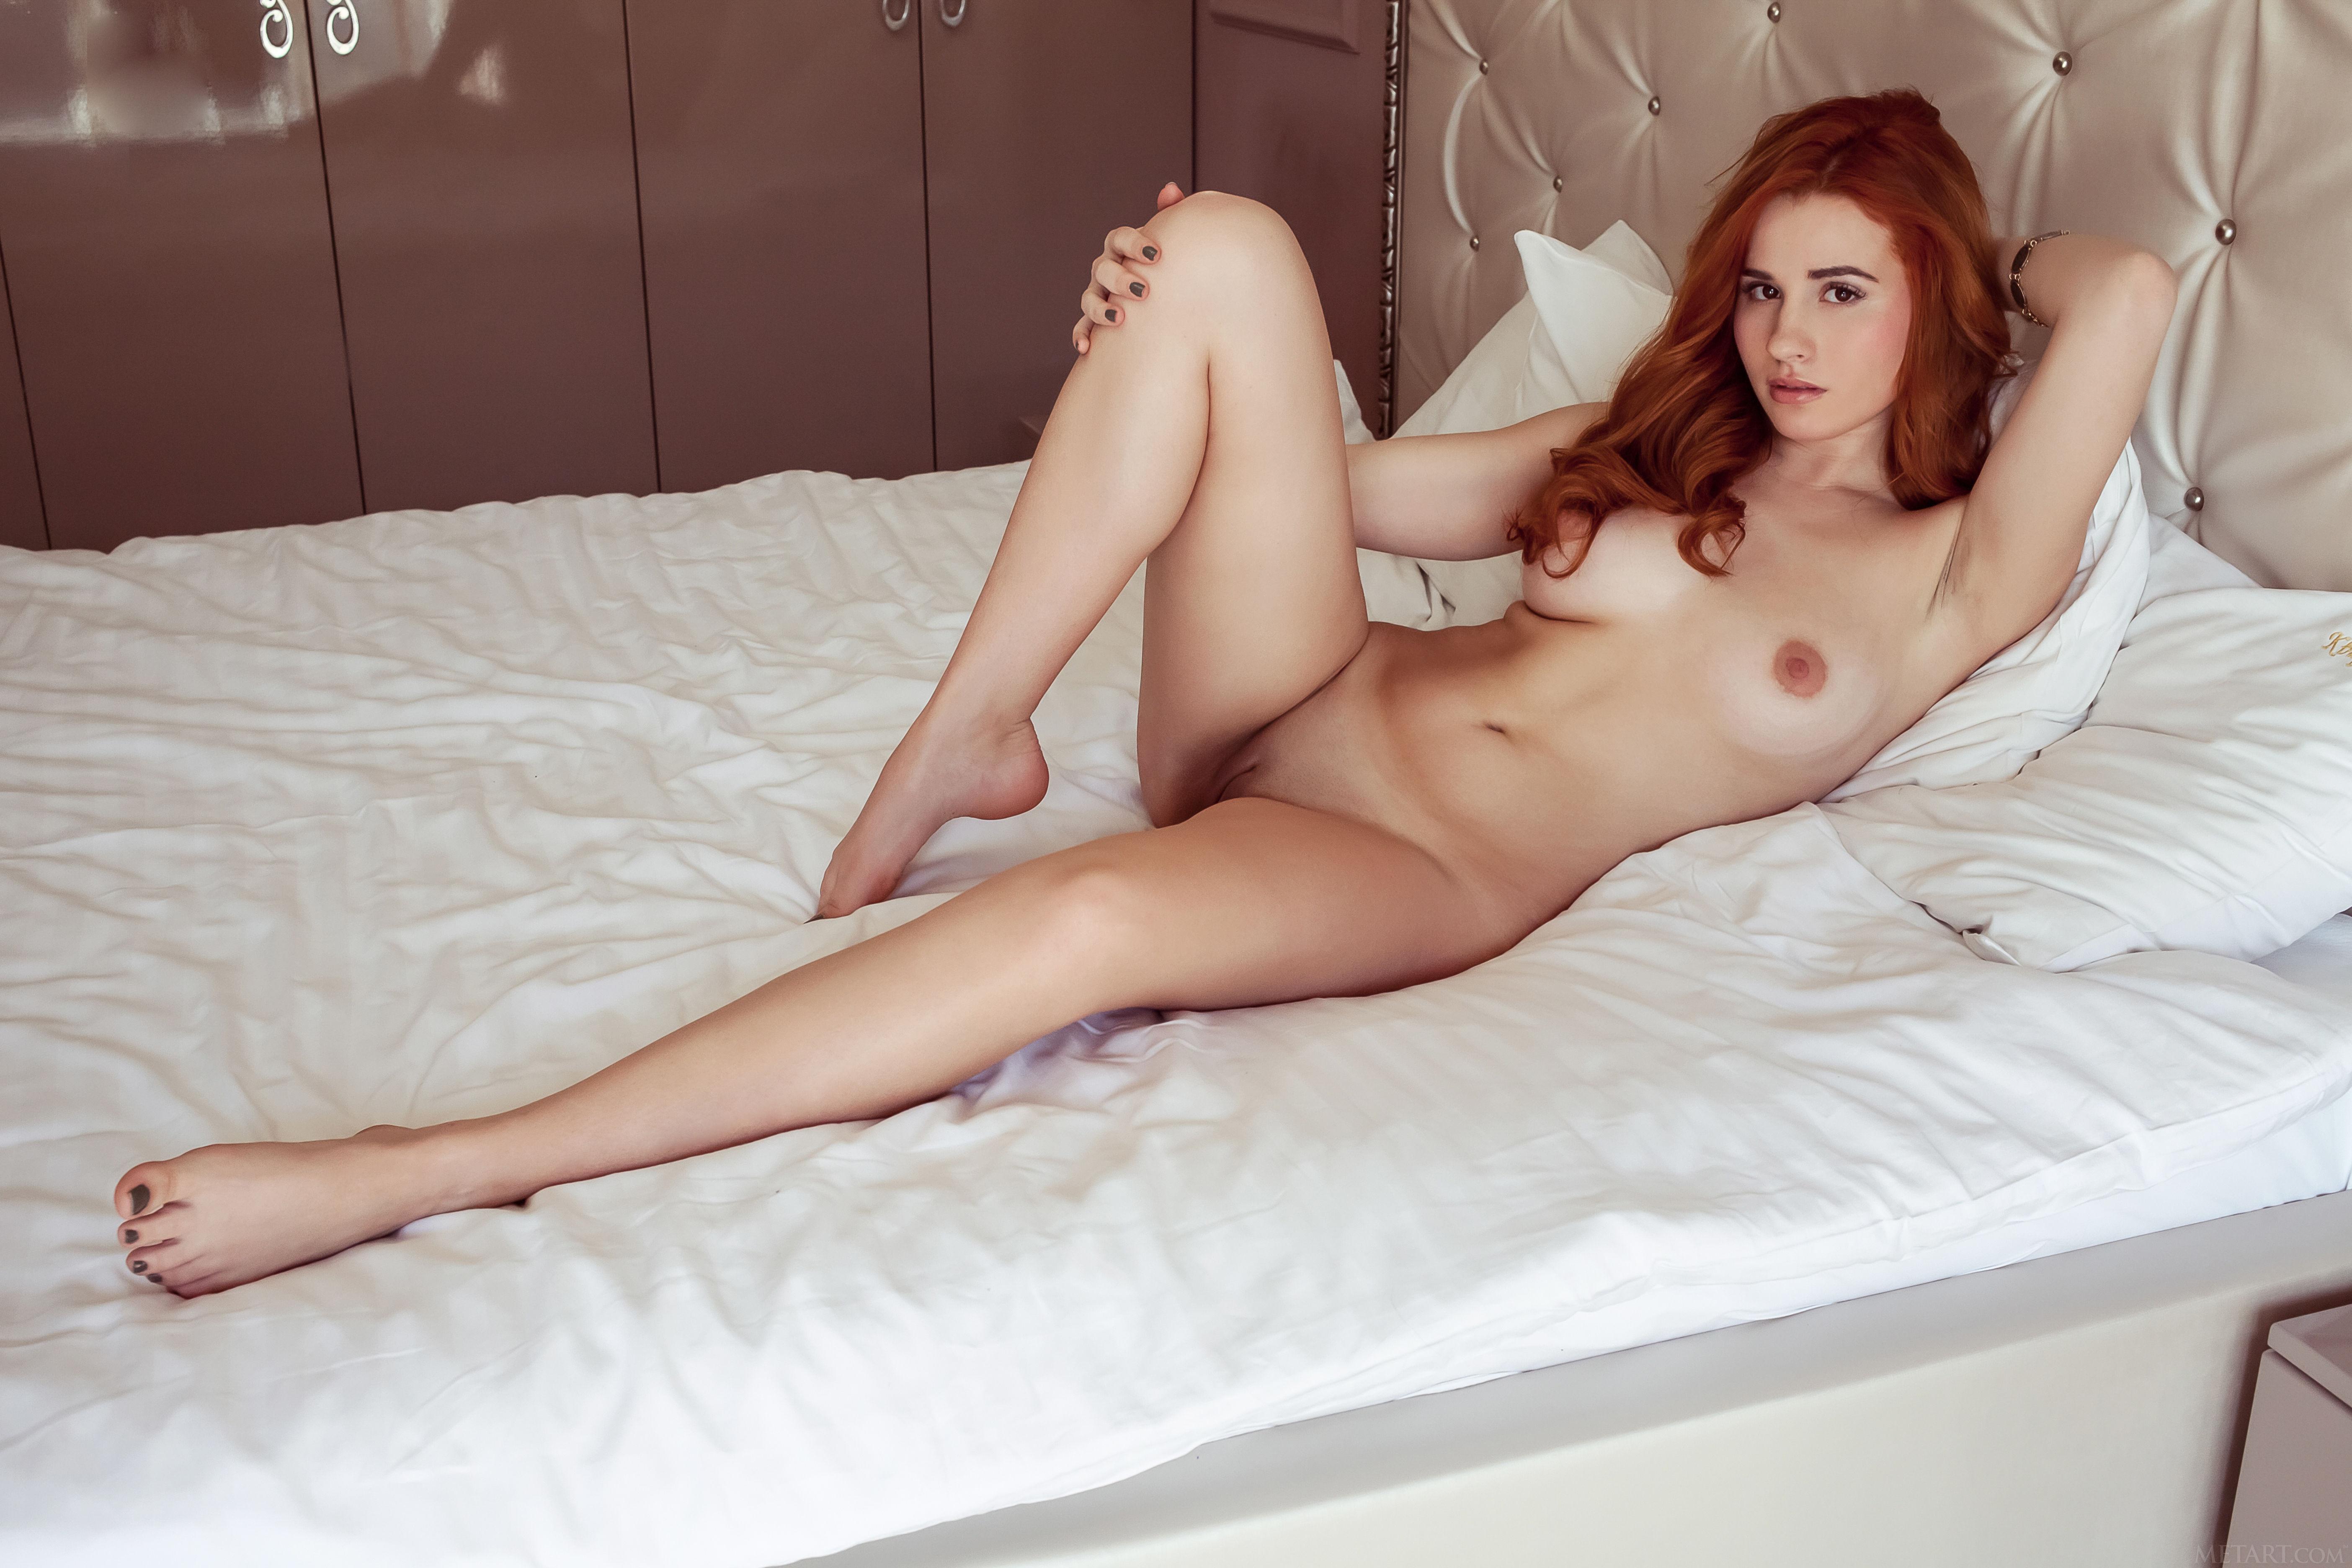 обои Nicole La Cray, модель, красотка, голая картинки фото